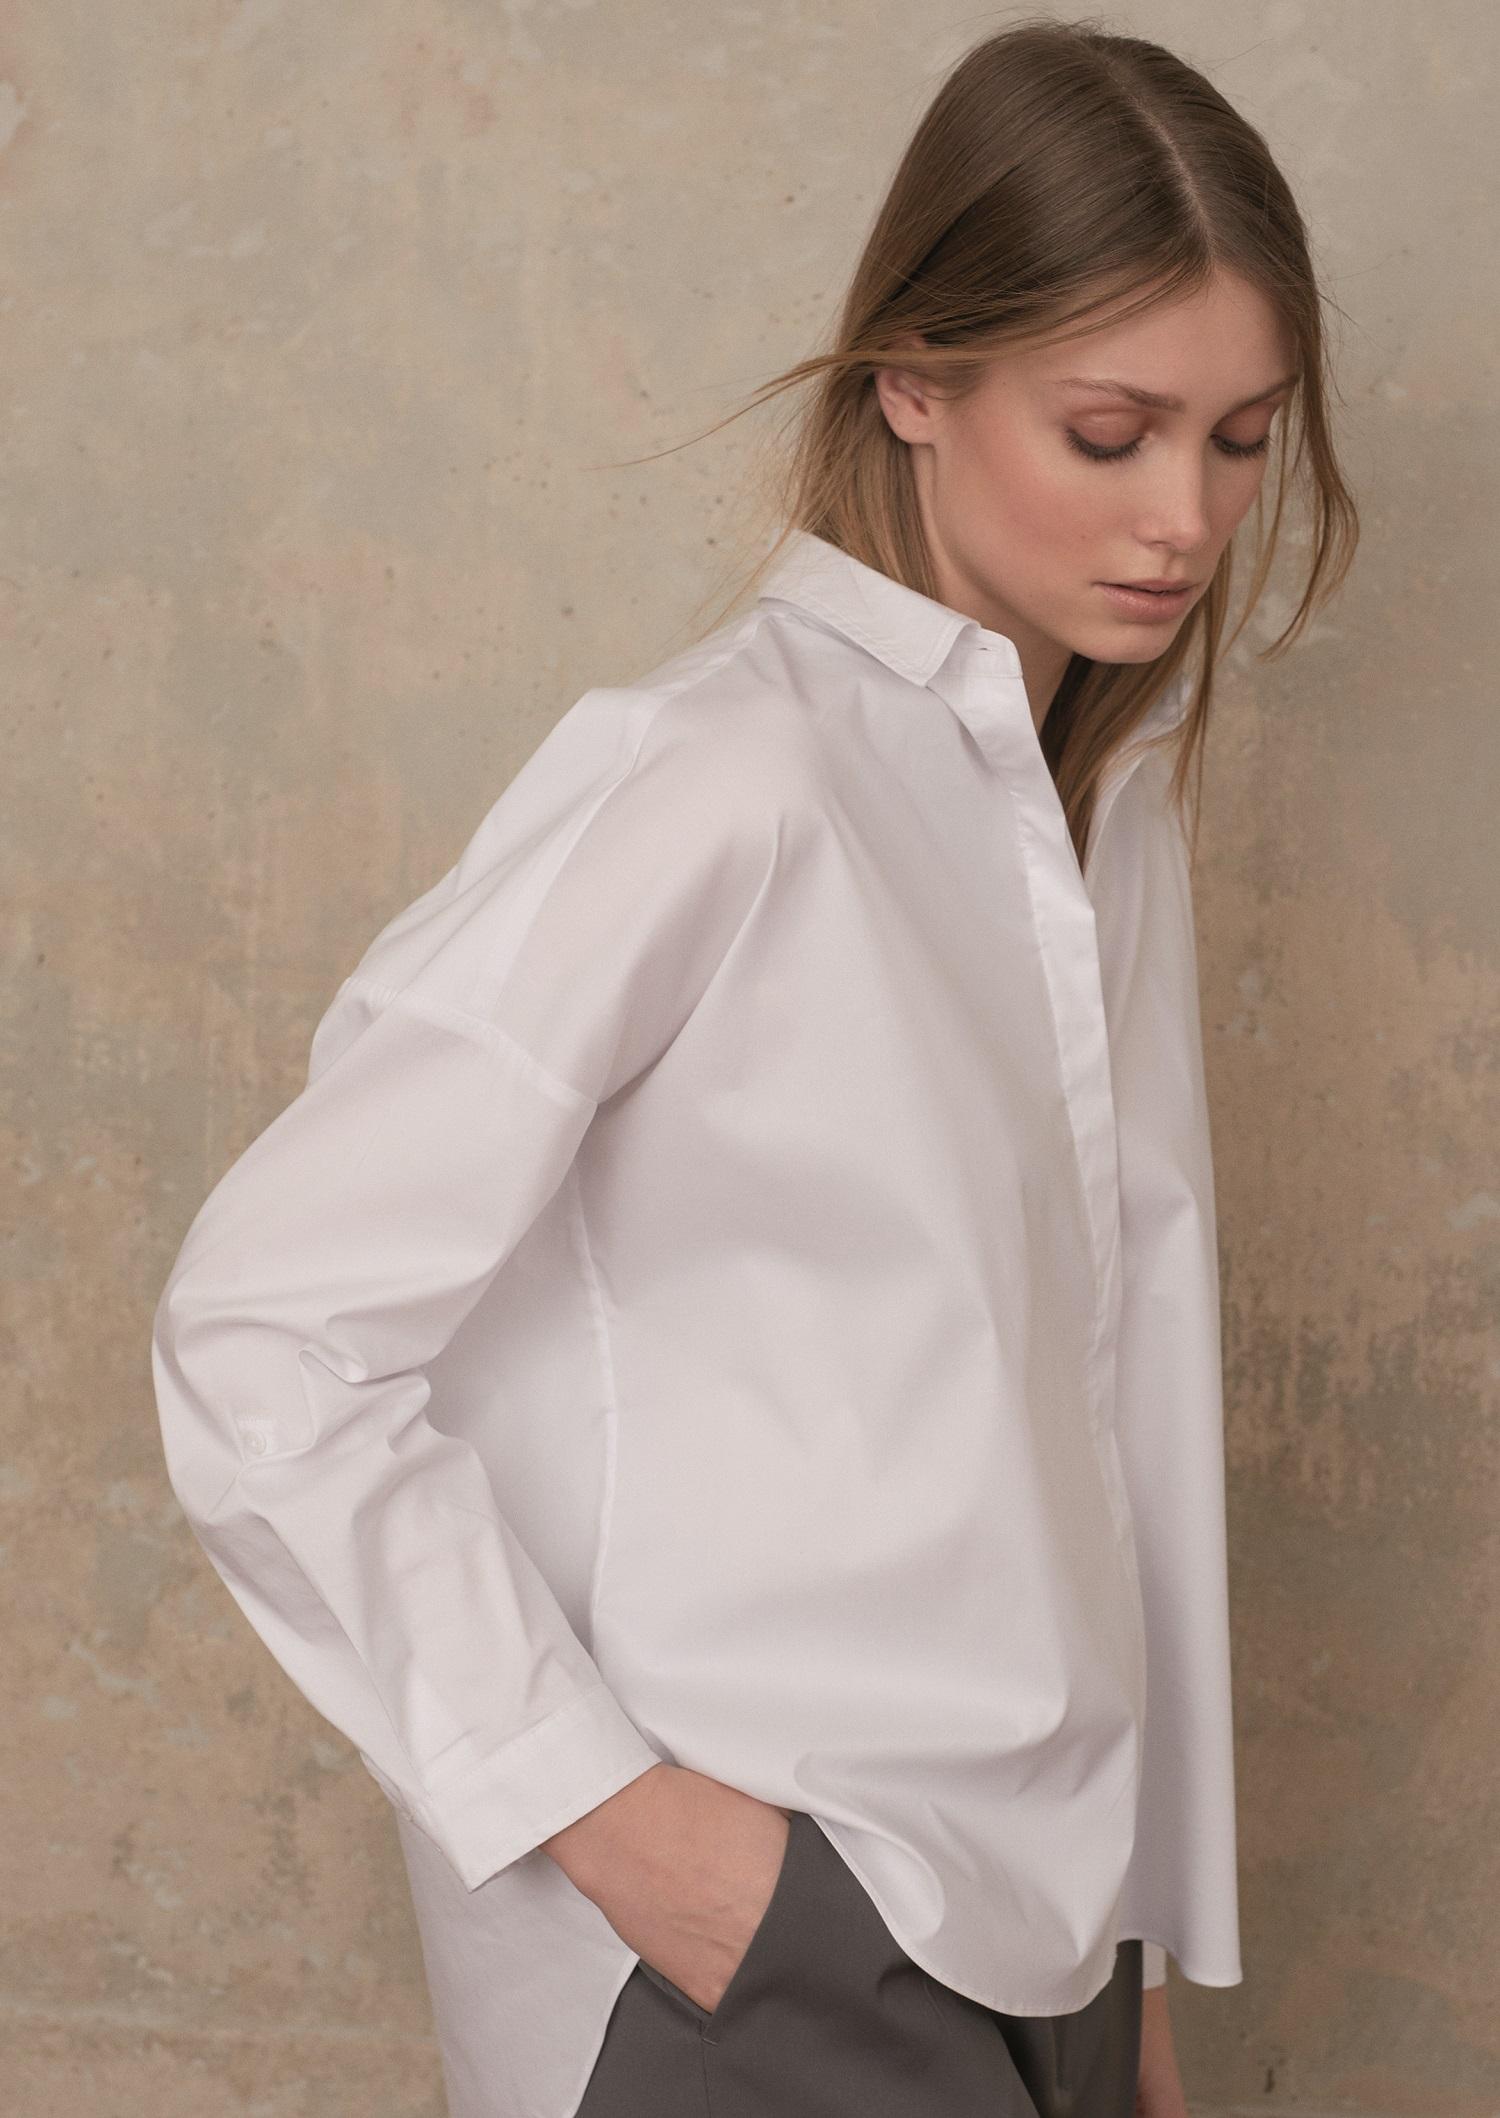 Model trägt weisse Oversized-Bluse